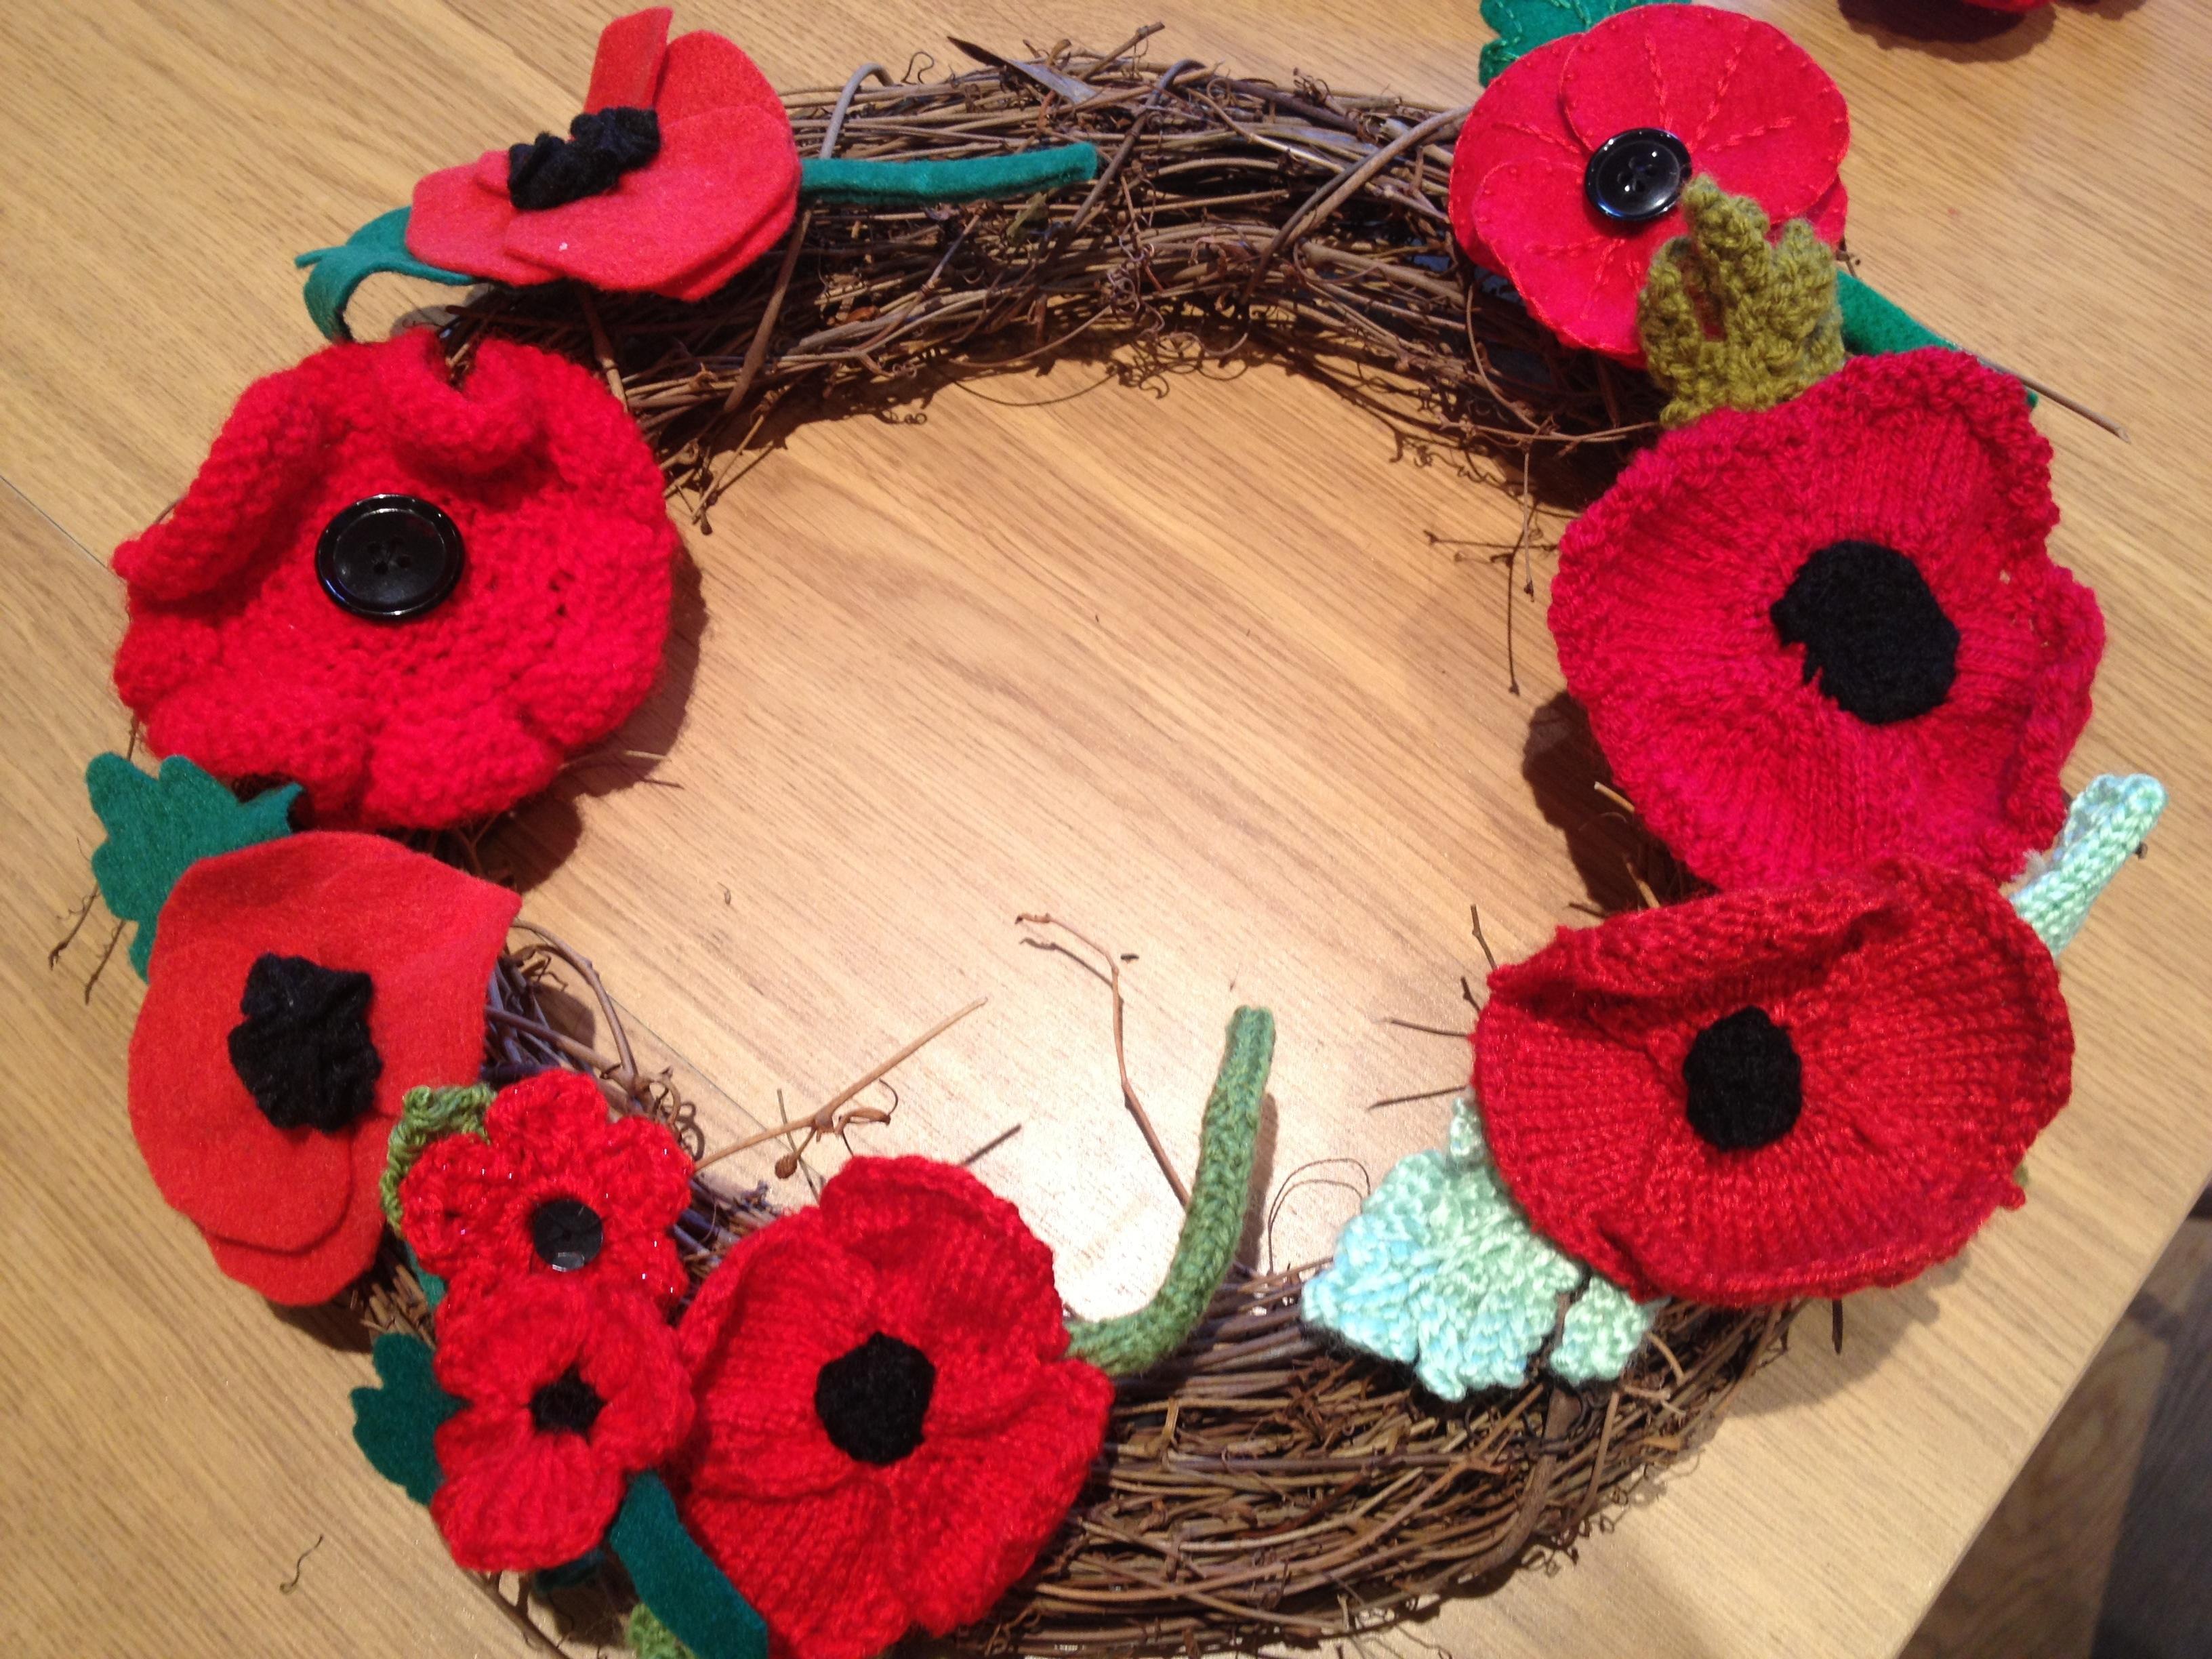 How to make a knitted or crochet poppy wreath womans weekly poppy wreath mightylinksfo